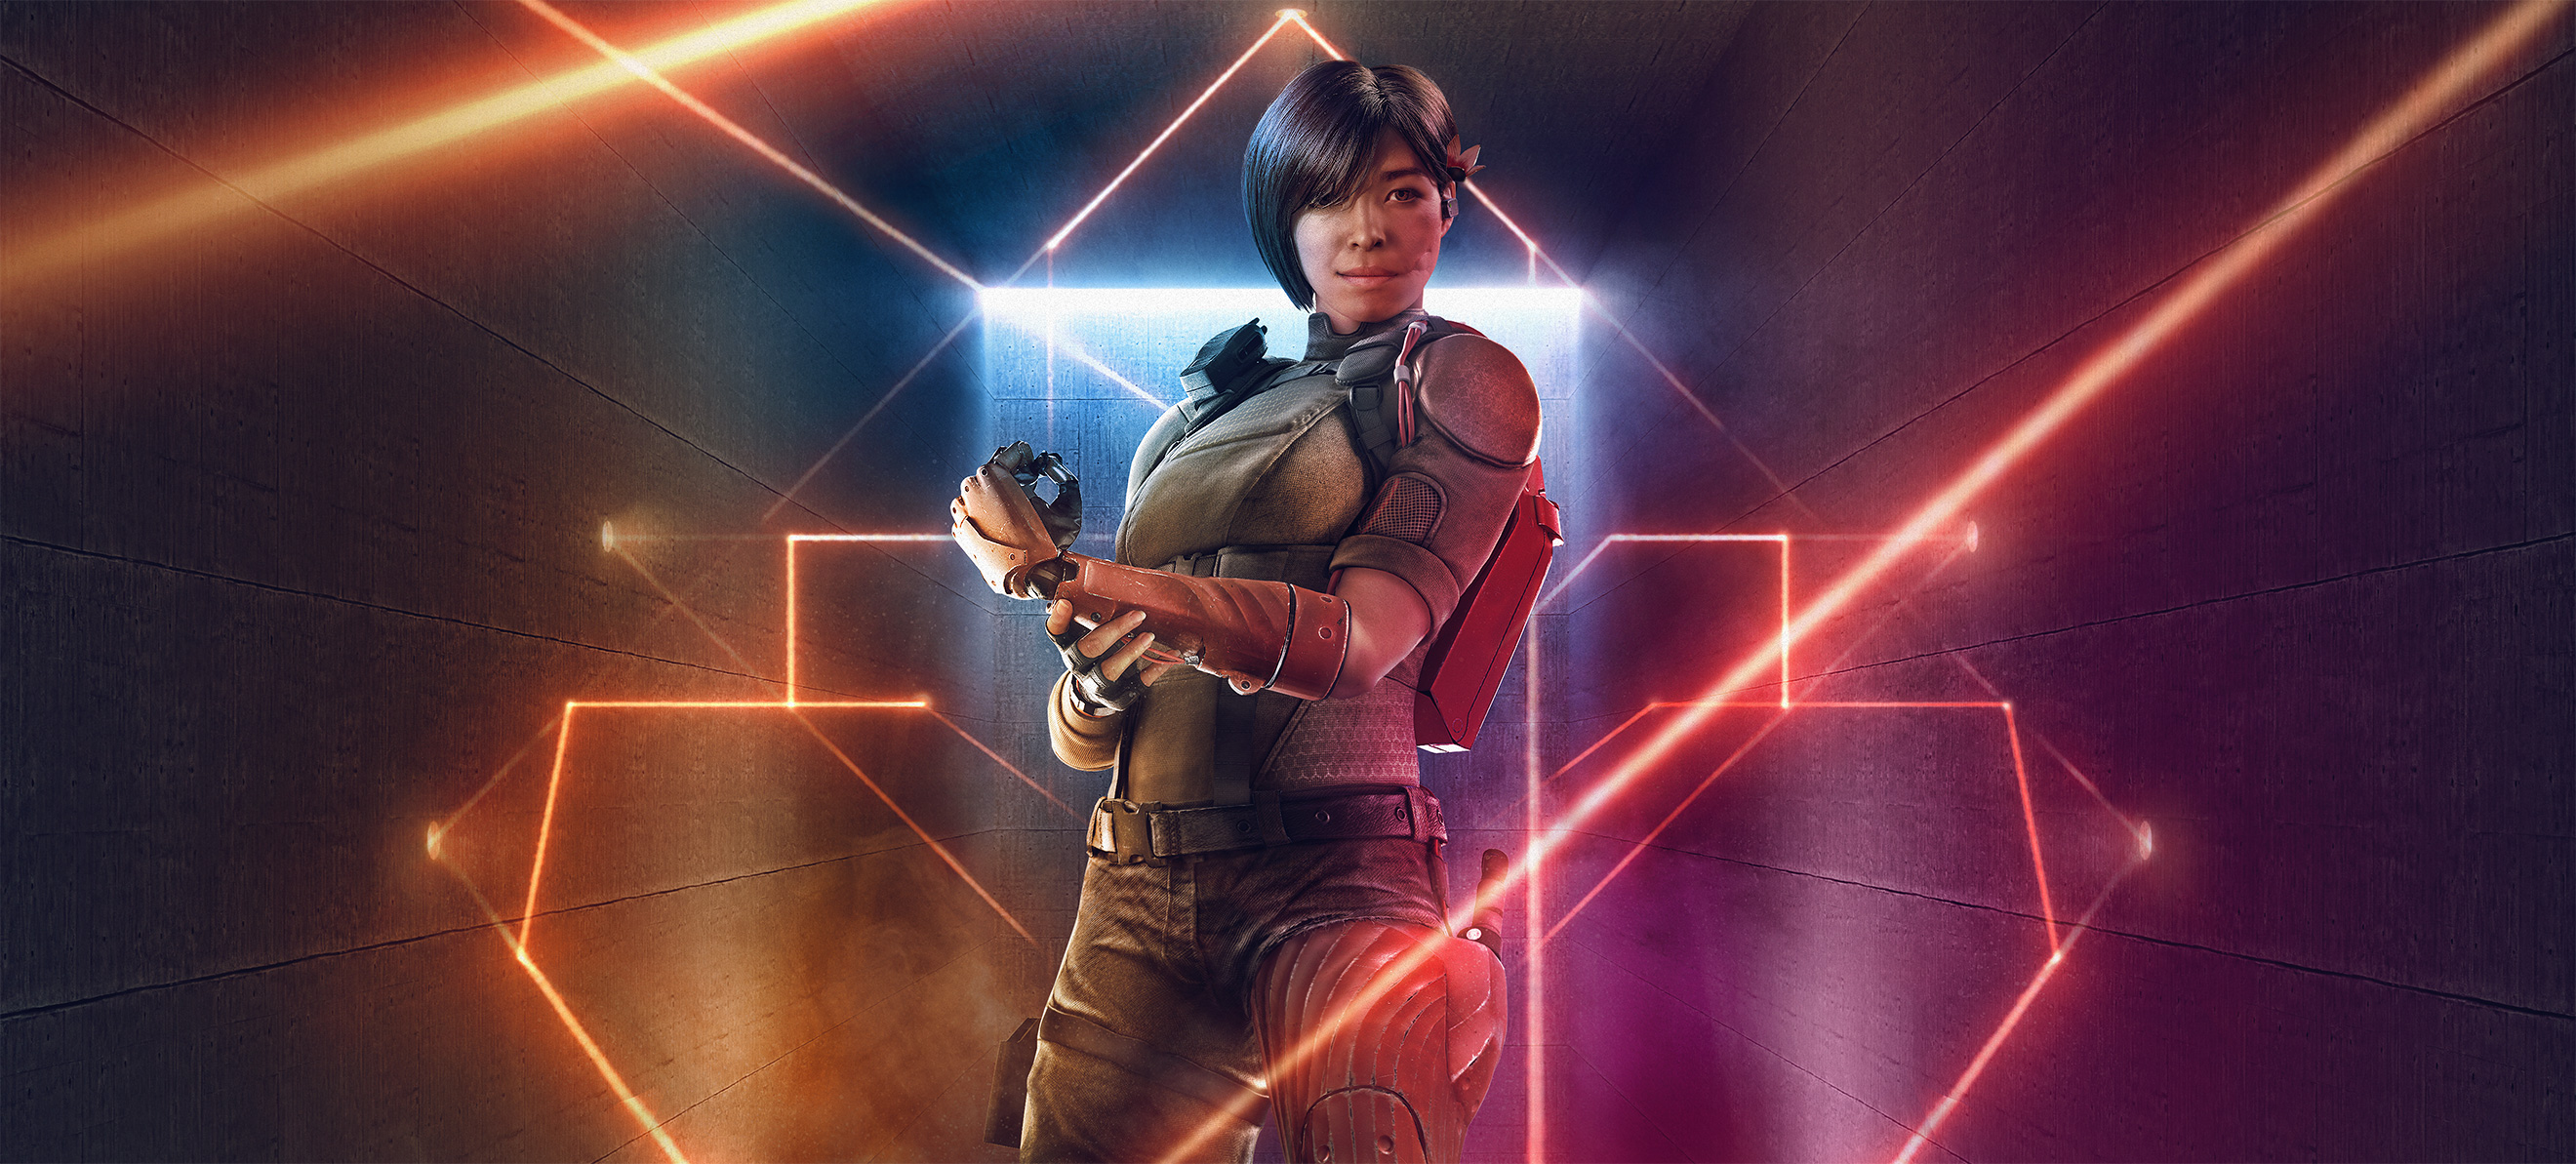 Rainbow Six Siege's next season is Operation Neon Dawn